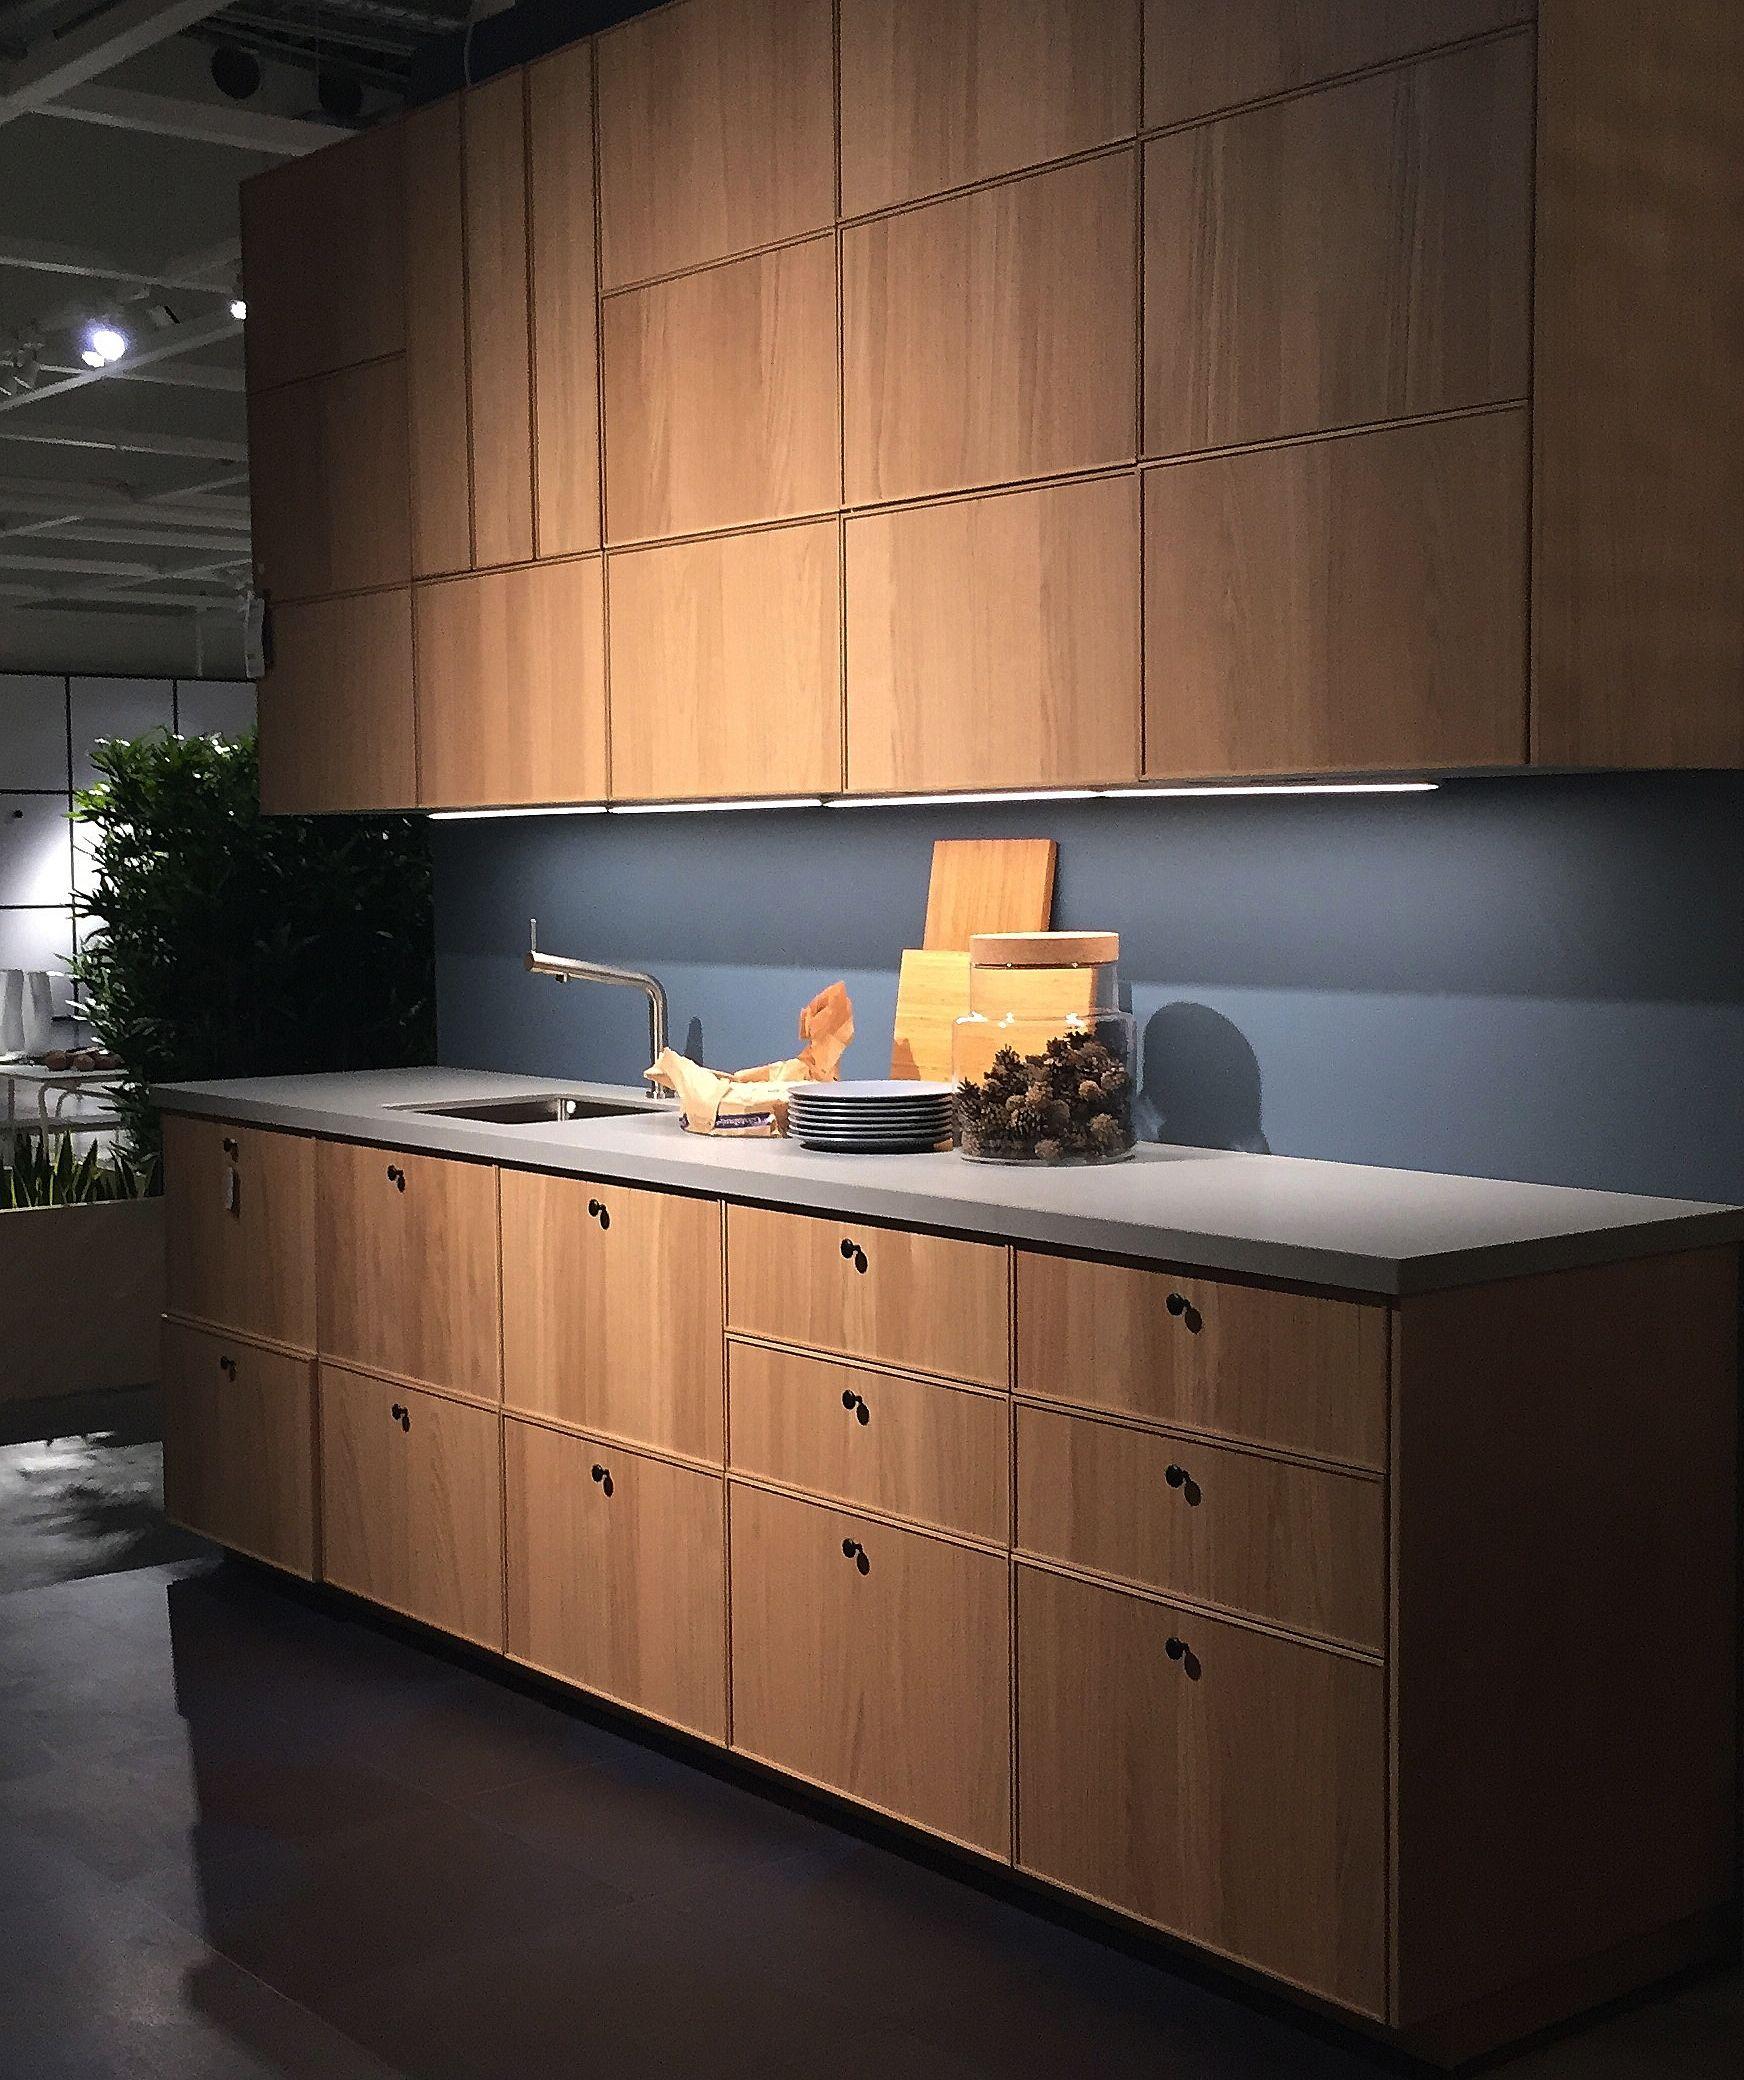 Ikea Ekestad Keuken Minimalistische Bespoke Birch Ply And Formica